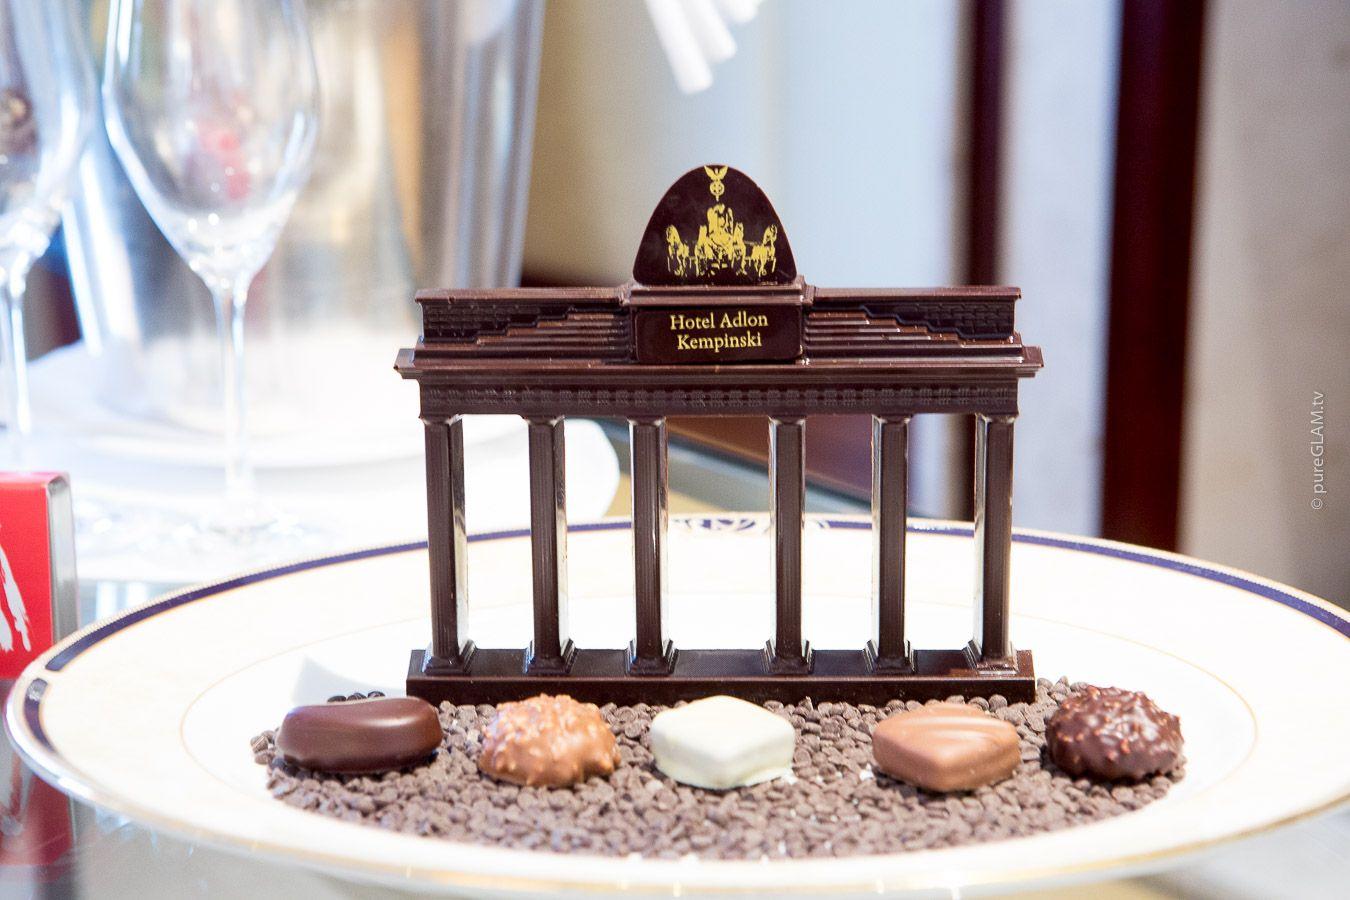 Das Hotel Adlon In Berlin Besondere Momente Einmaliger Ausblick Luxus Pur Hotel Amenities Hotel Branding Spa